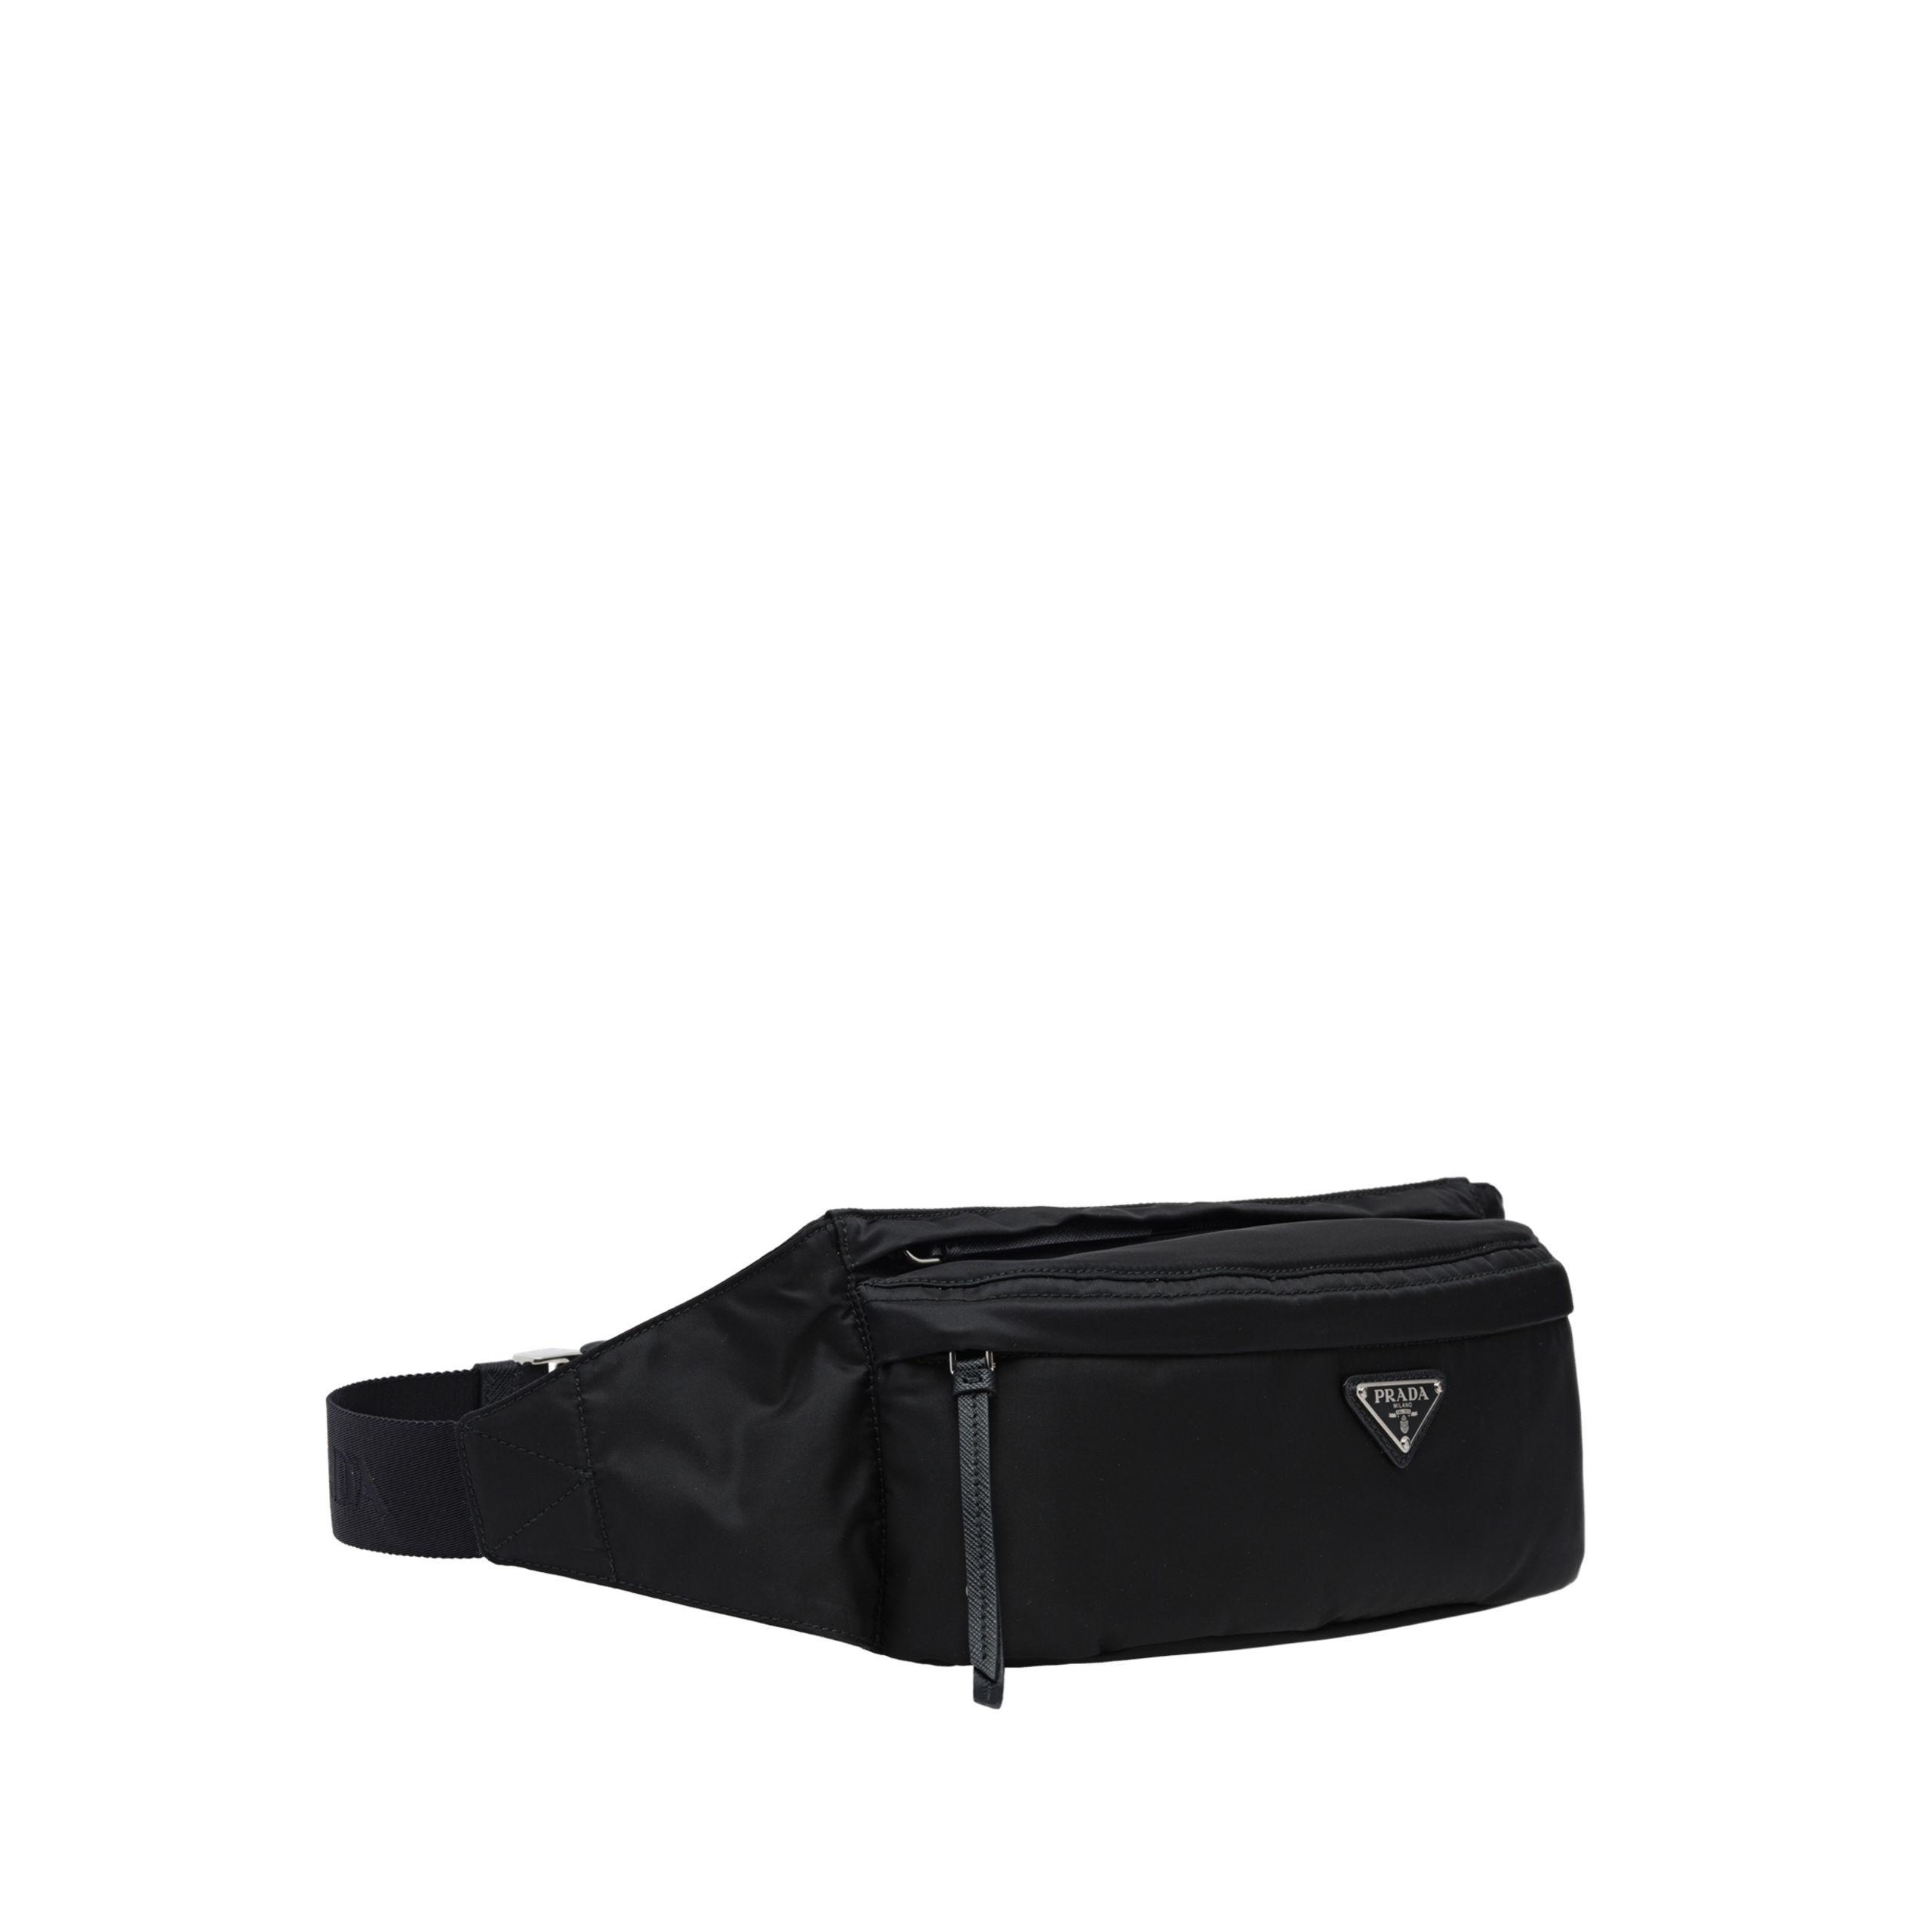 e6238181c254 Prada - Black Fabric And Leather Belt Bag - Lyst. View fullscreen